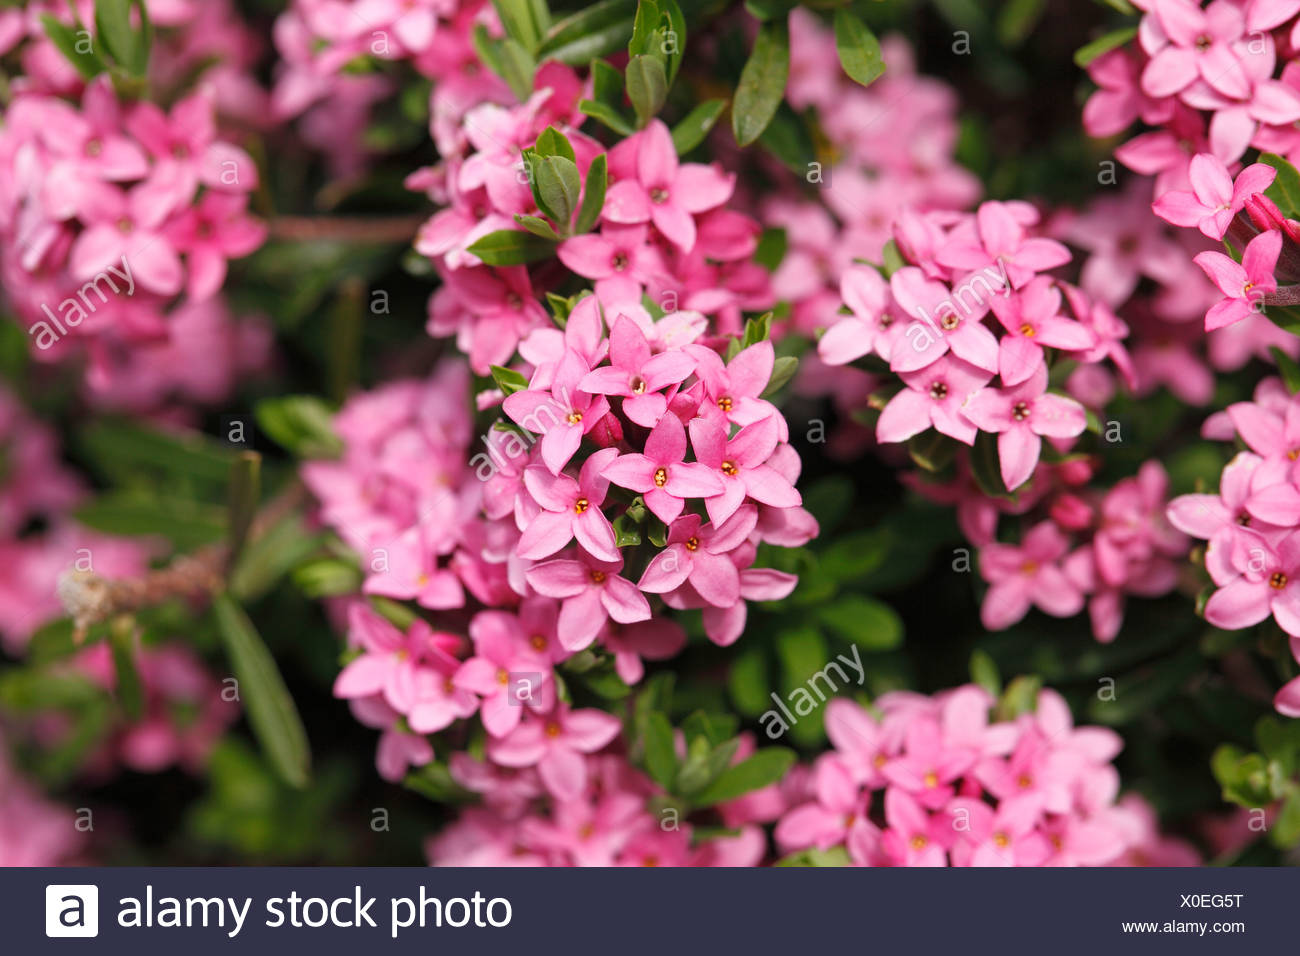 Garland flower or Rose Daphne (Daphne cneorum), Styria, Austria, Europe - Stock Image